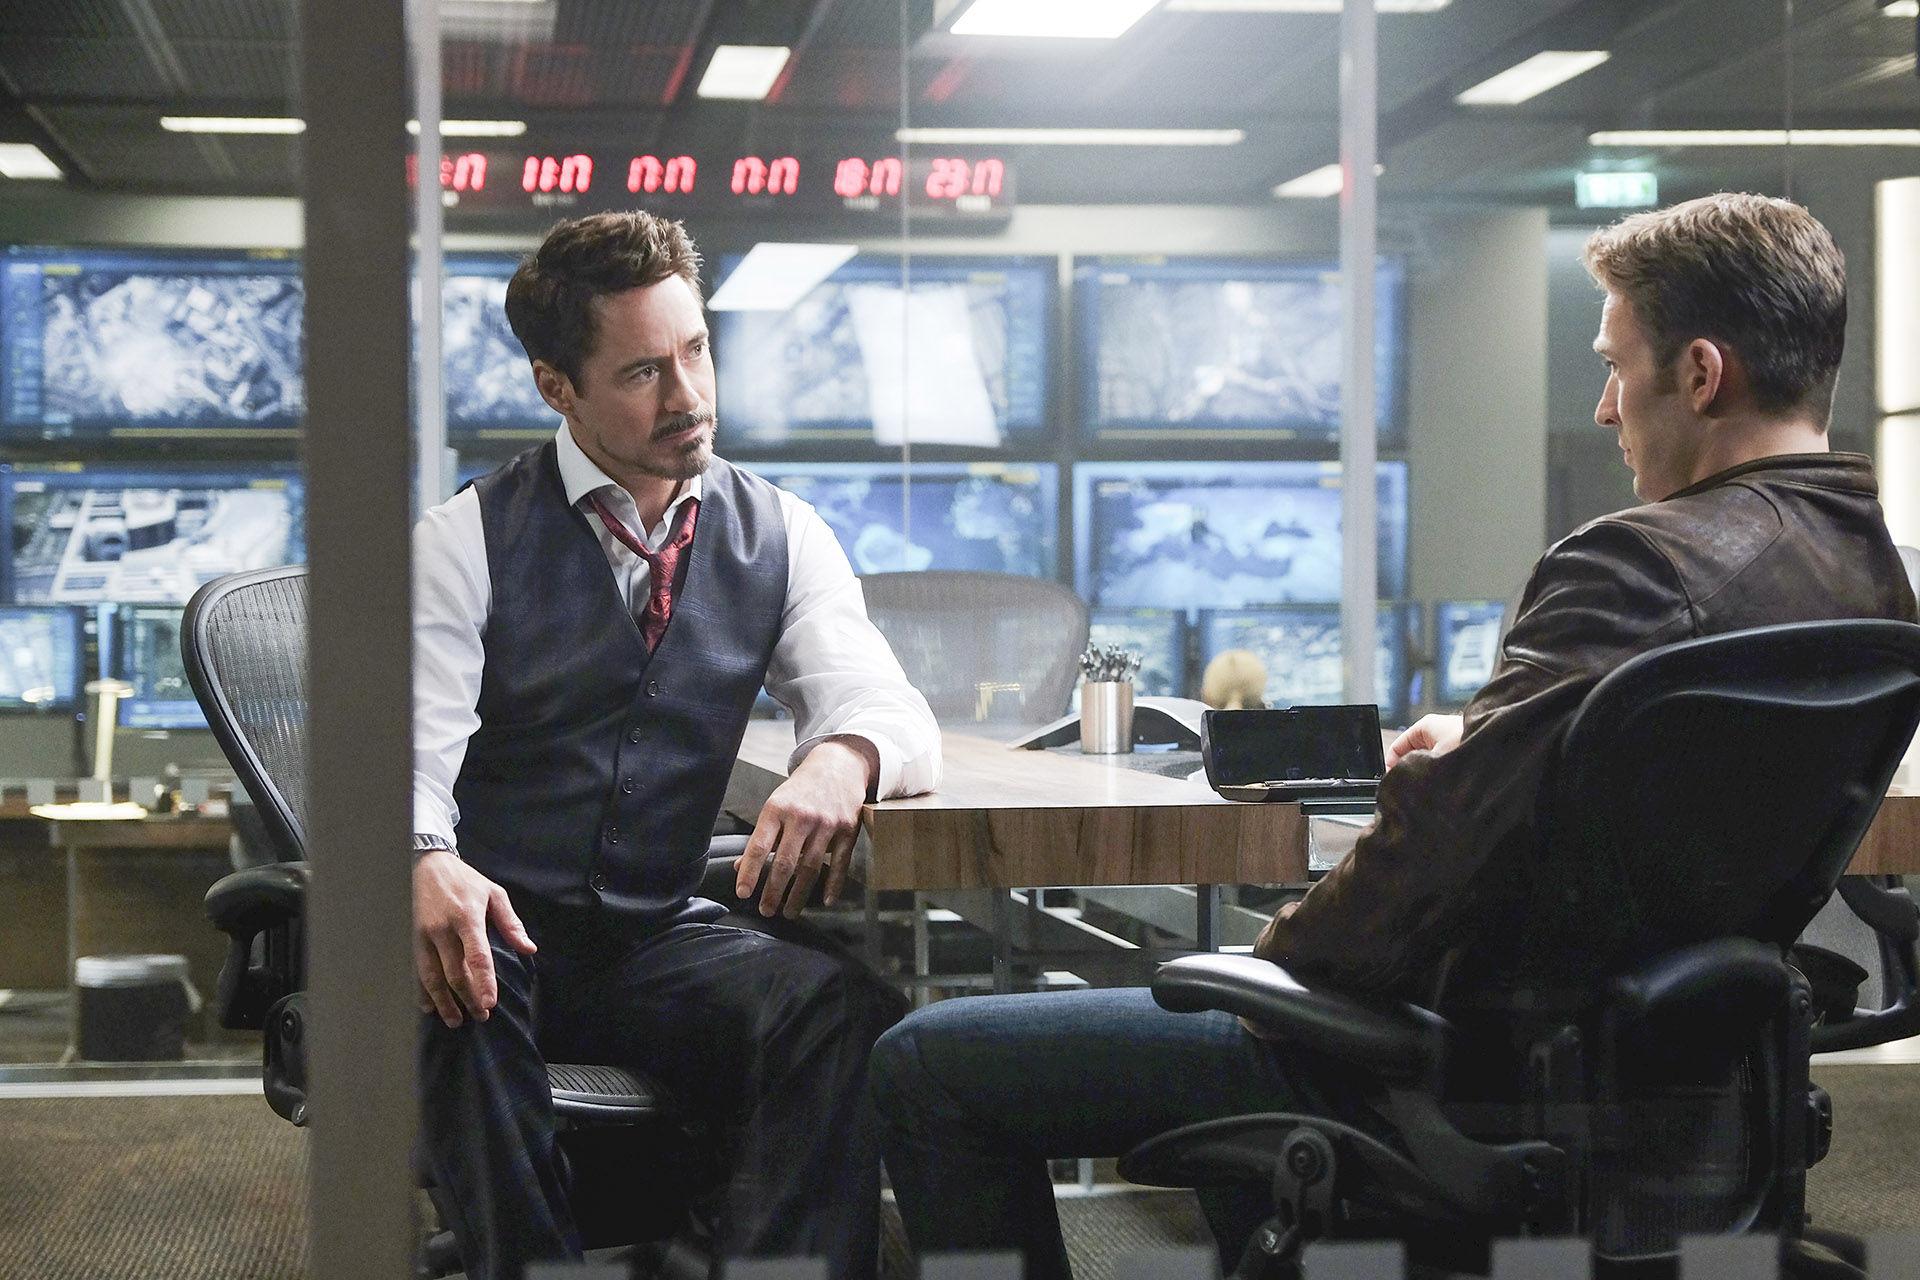 Captain-America-Civil-War-Tony-Stark-Meeting